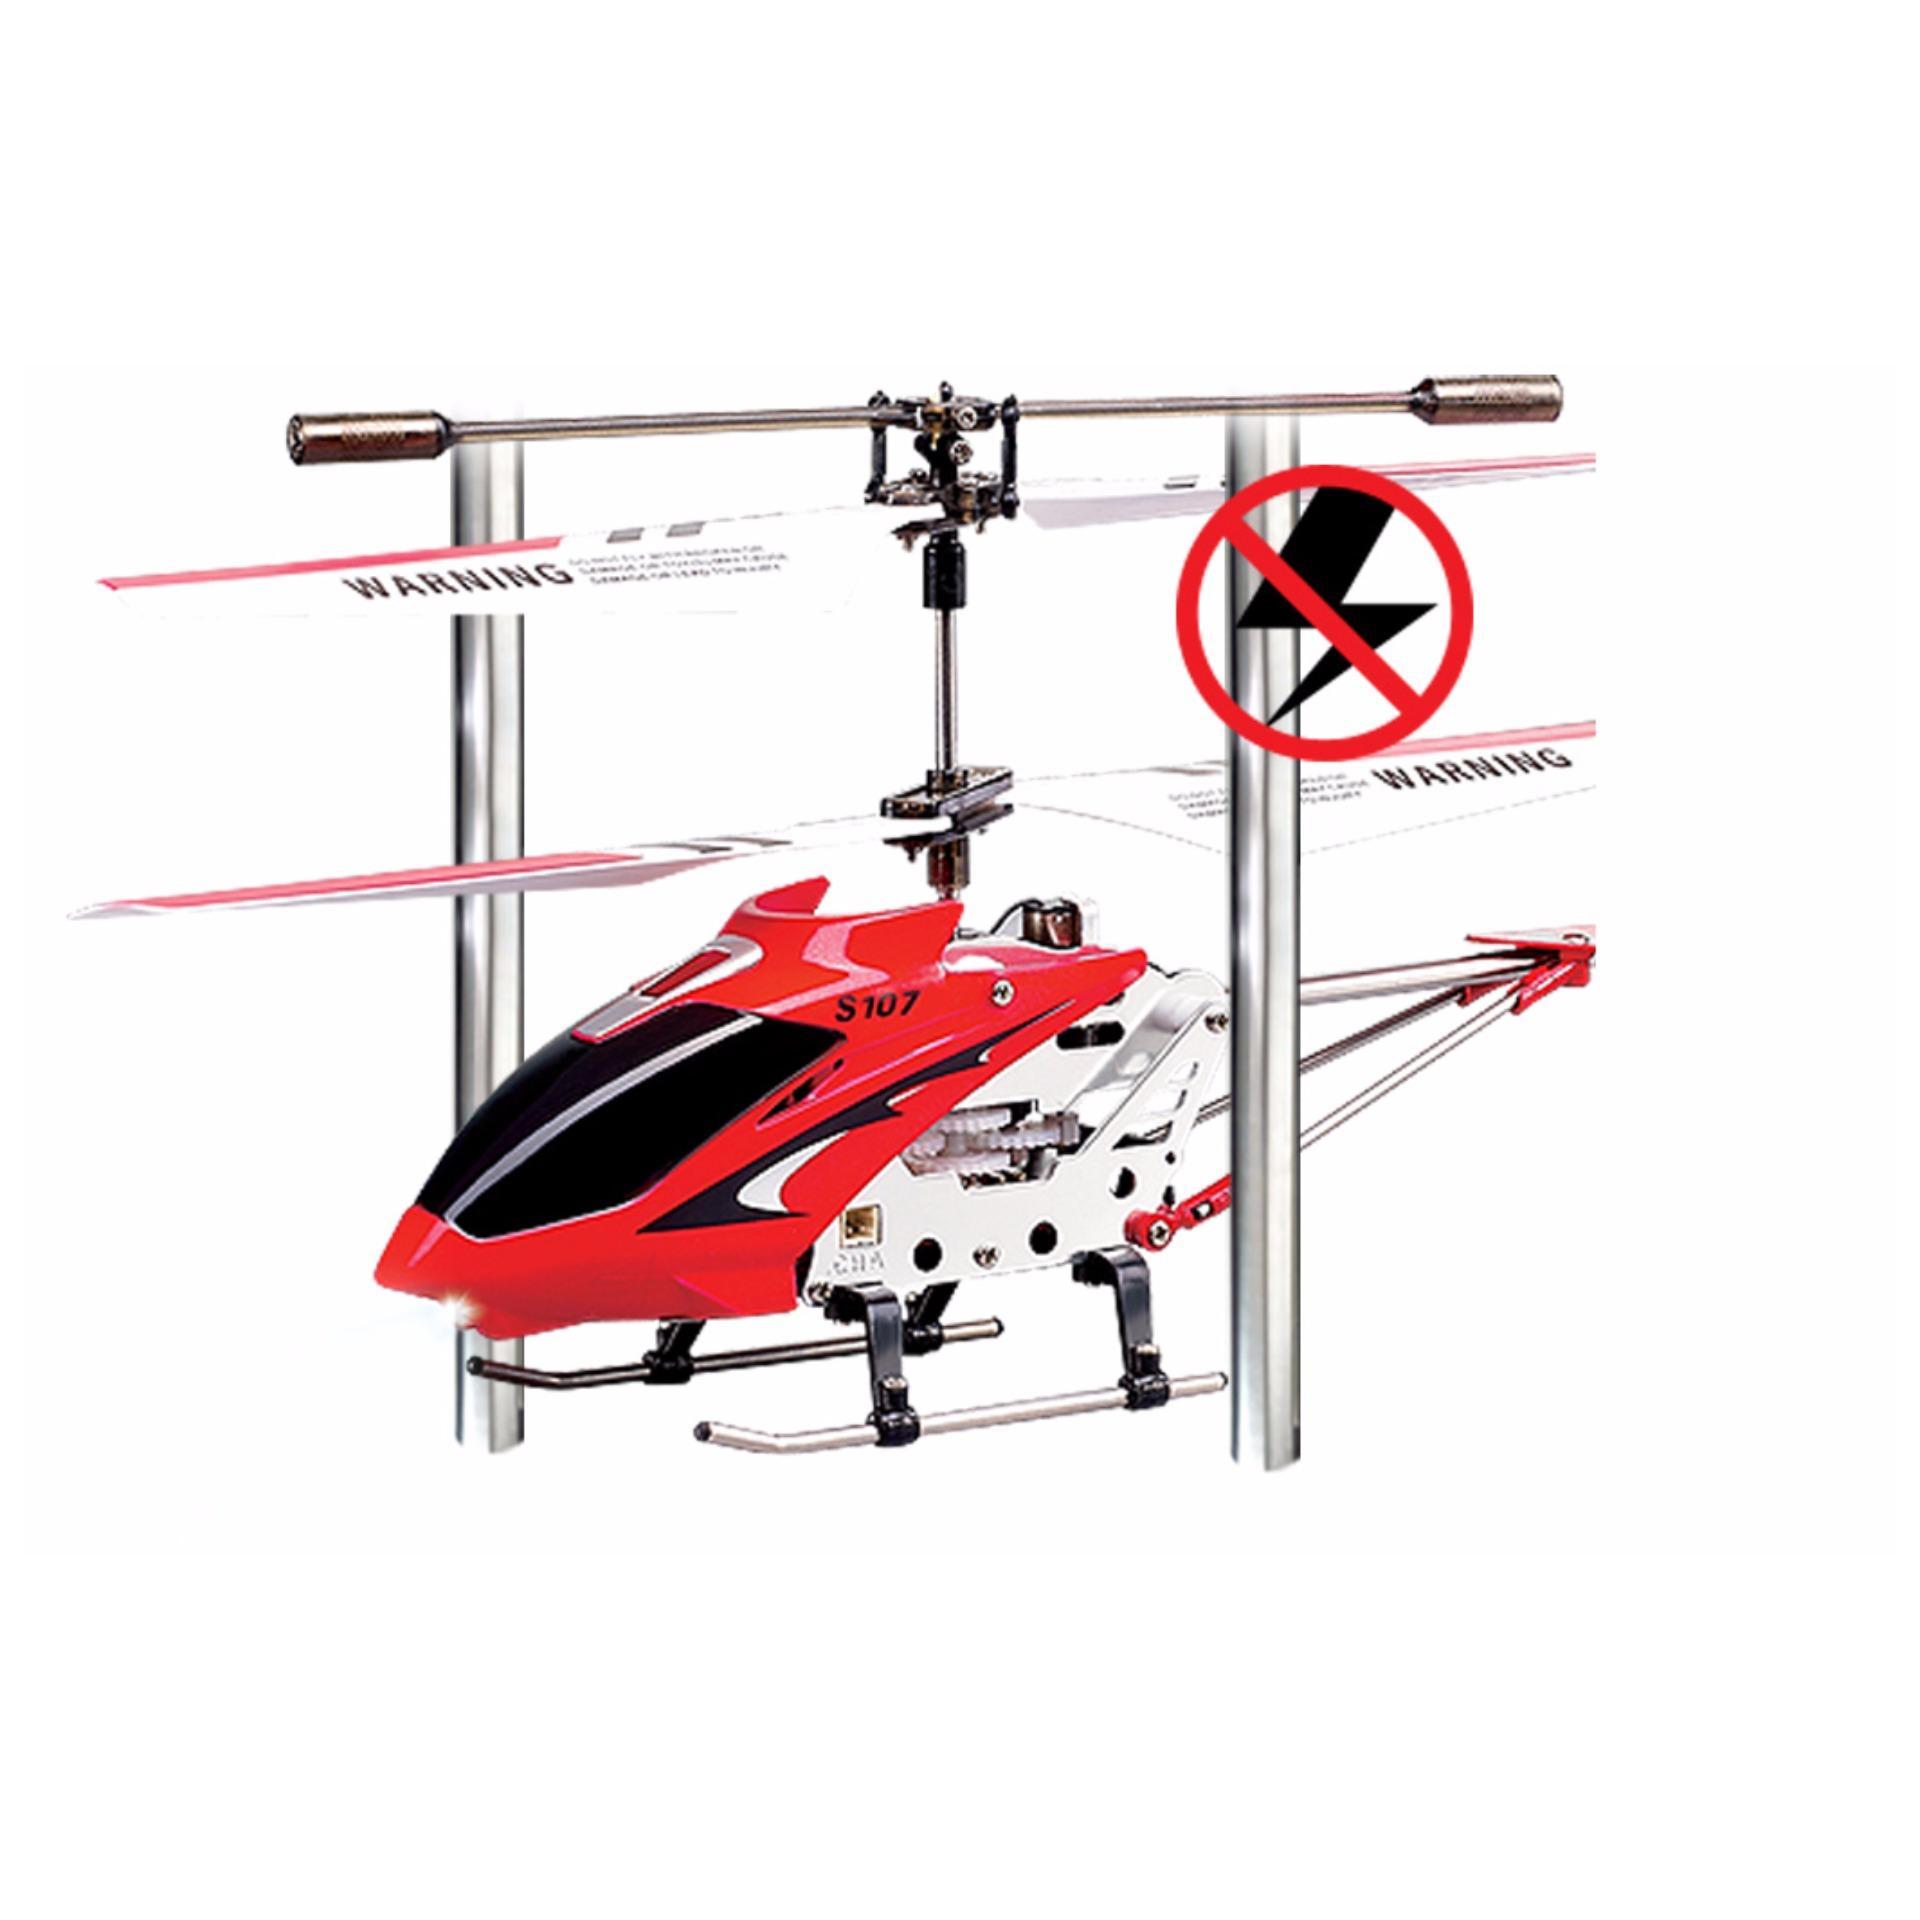 Pencarian Termurah Syma S107g 35ch Mini Helicopter Remote Control Drone Karakter Minion Sensor Helikopter Mainan Terbang